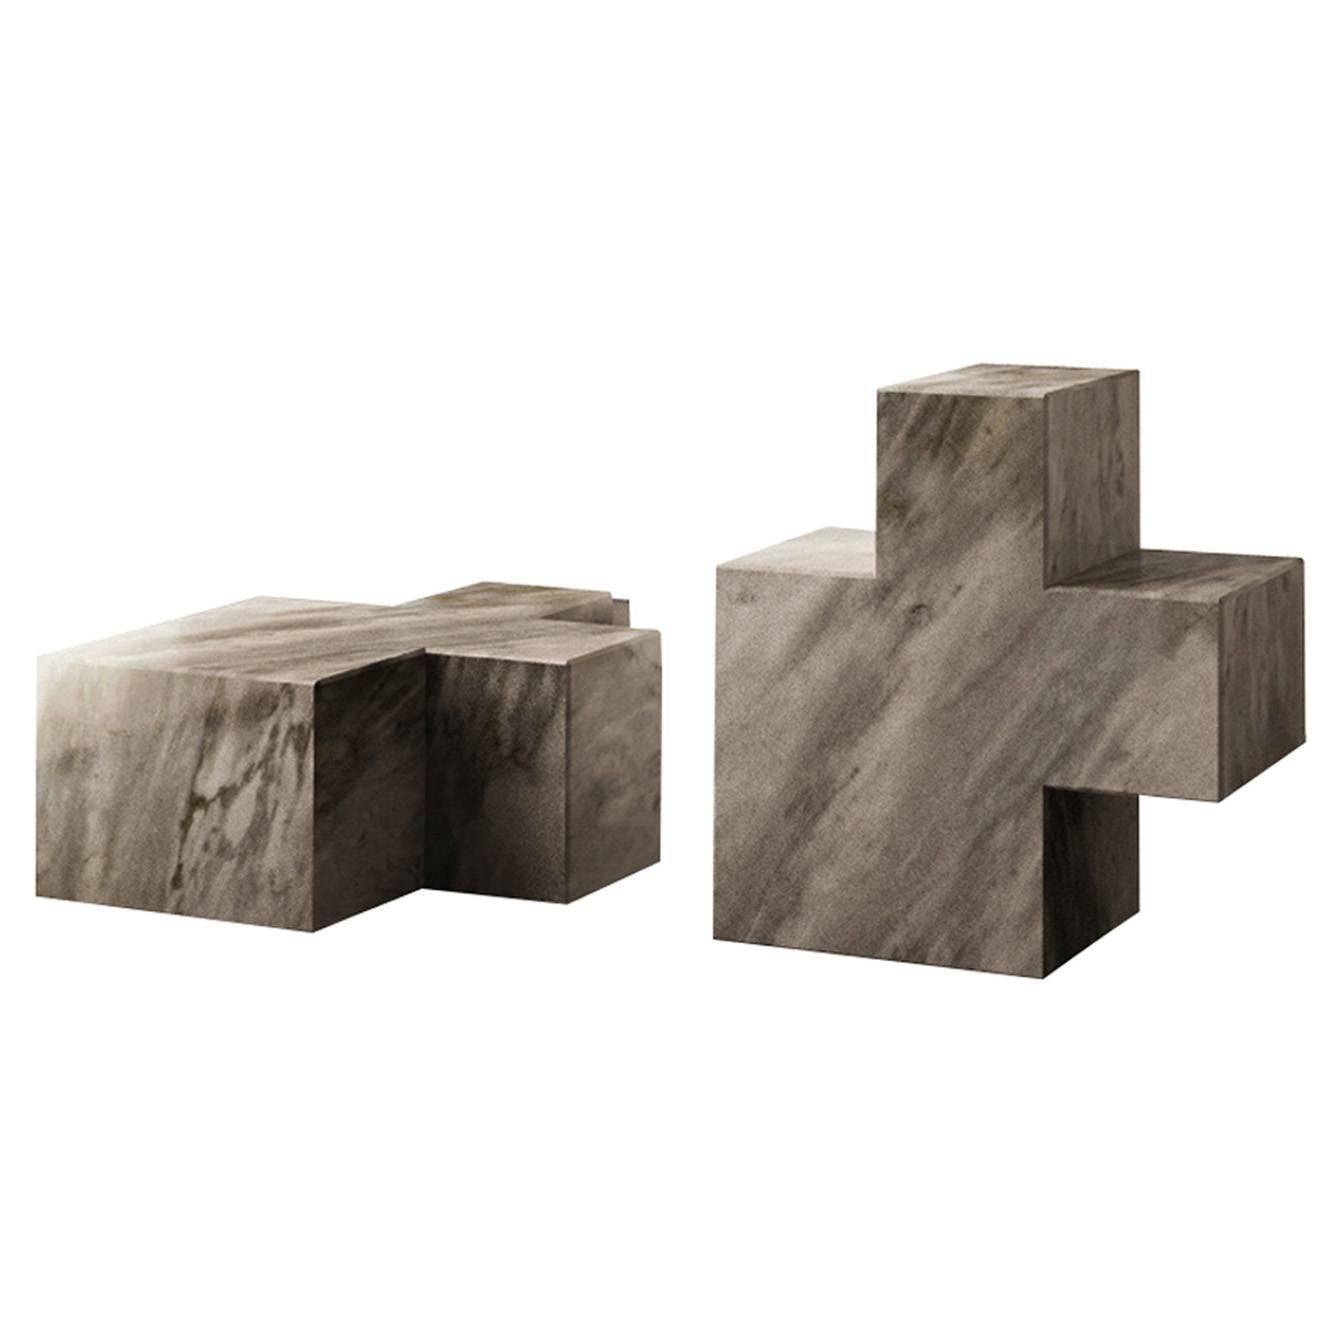 Two Q3 Elements Bardiglio Sculptures 1